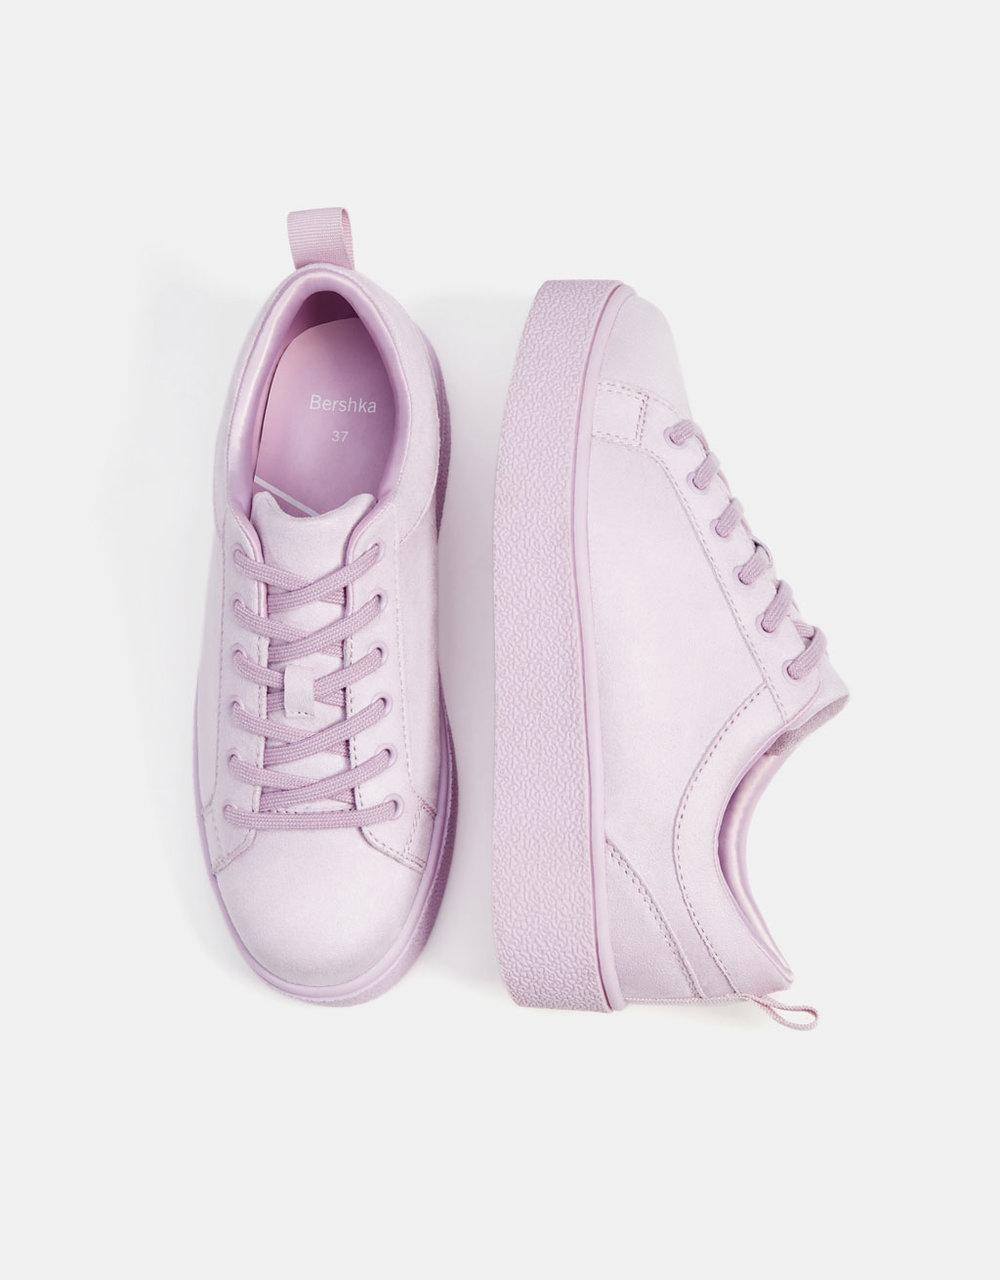 - Bershka / Lilac Monochrome Sneakers